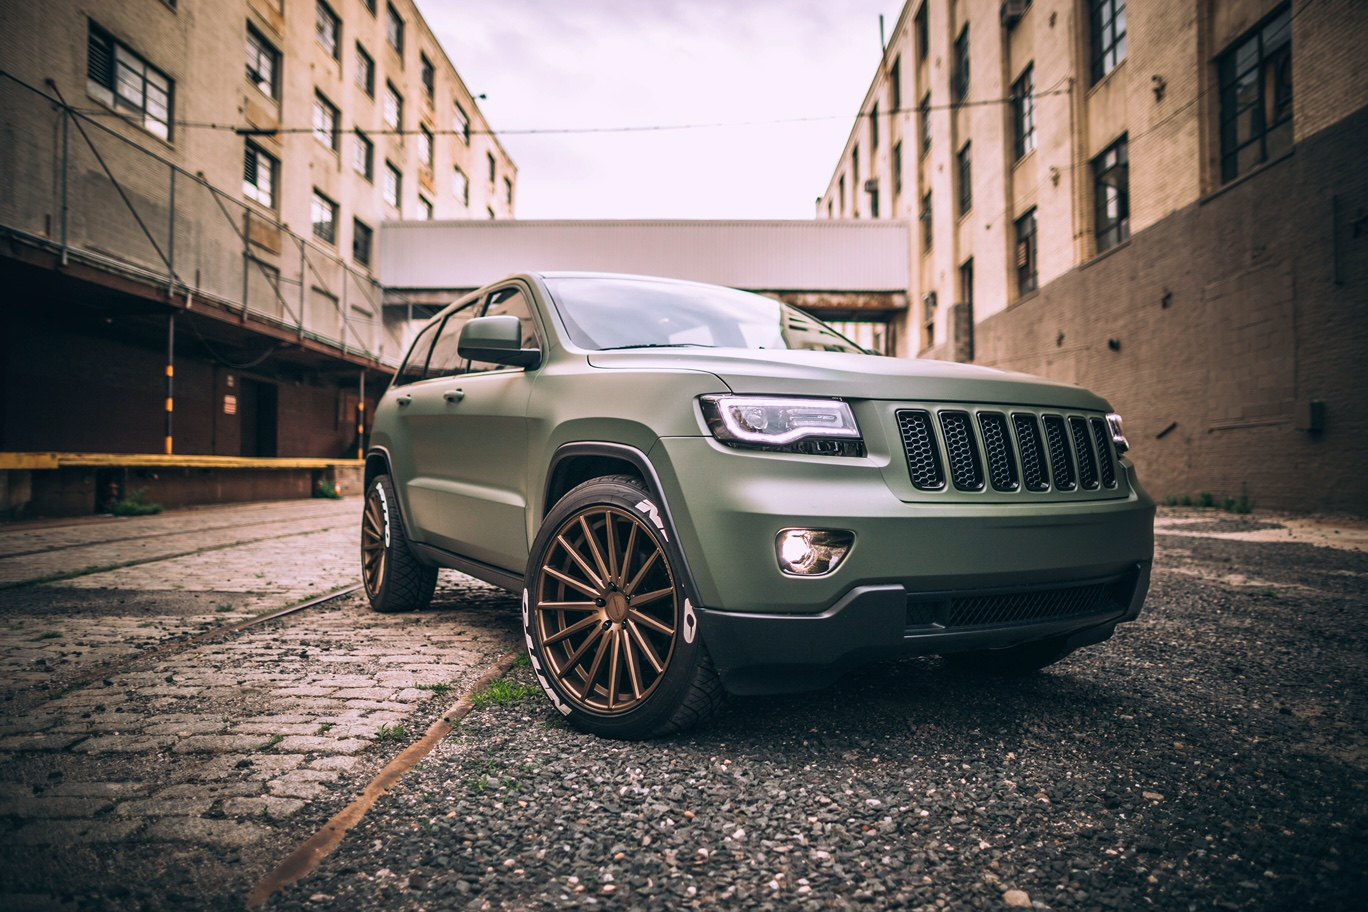 Custom 2018 Jeep Grand Cherokee Images Mods Photos